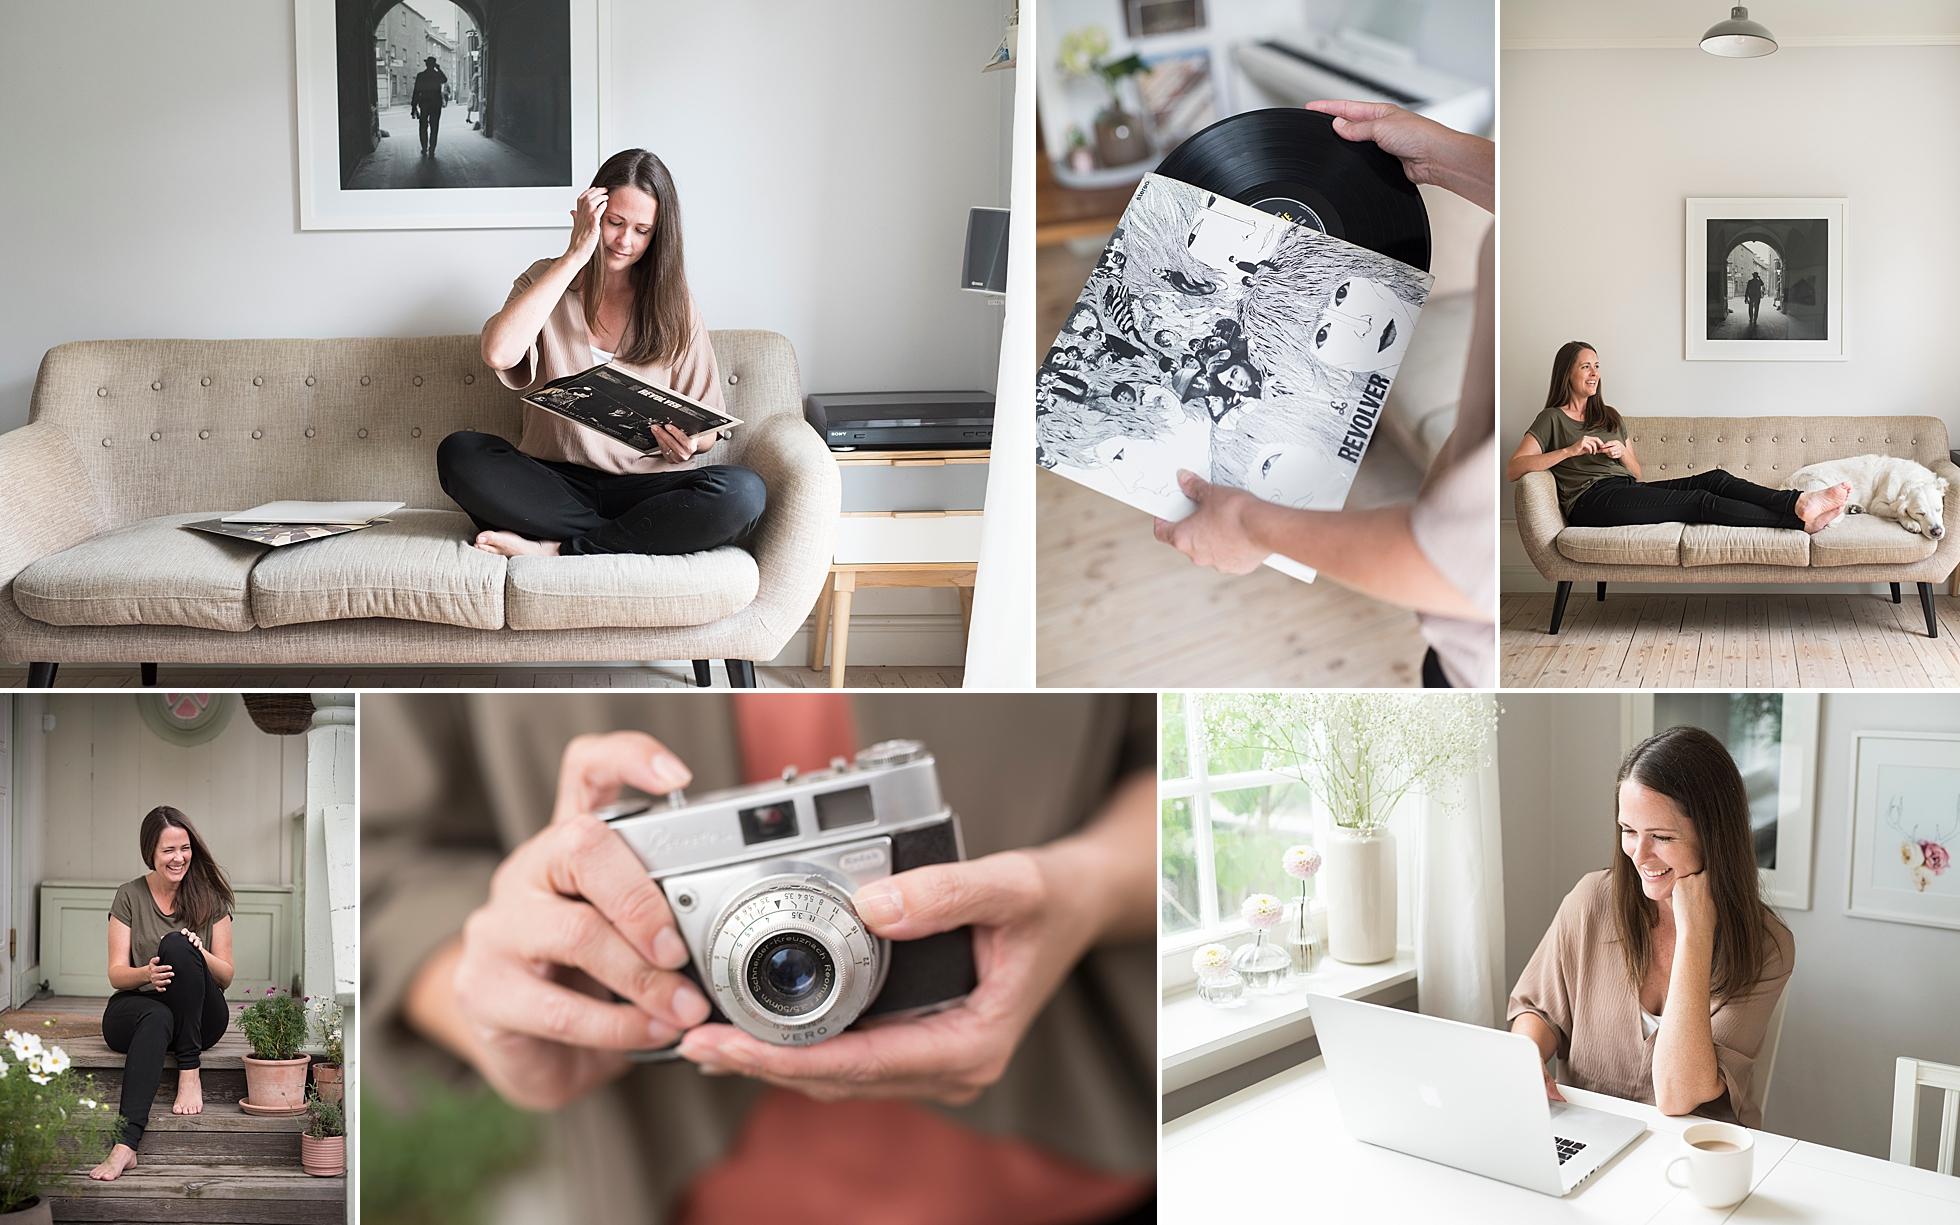 Branding photos of photographer Janine Laag